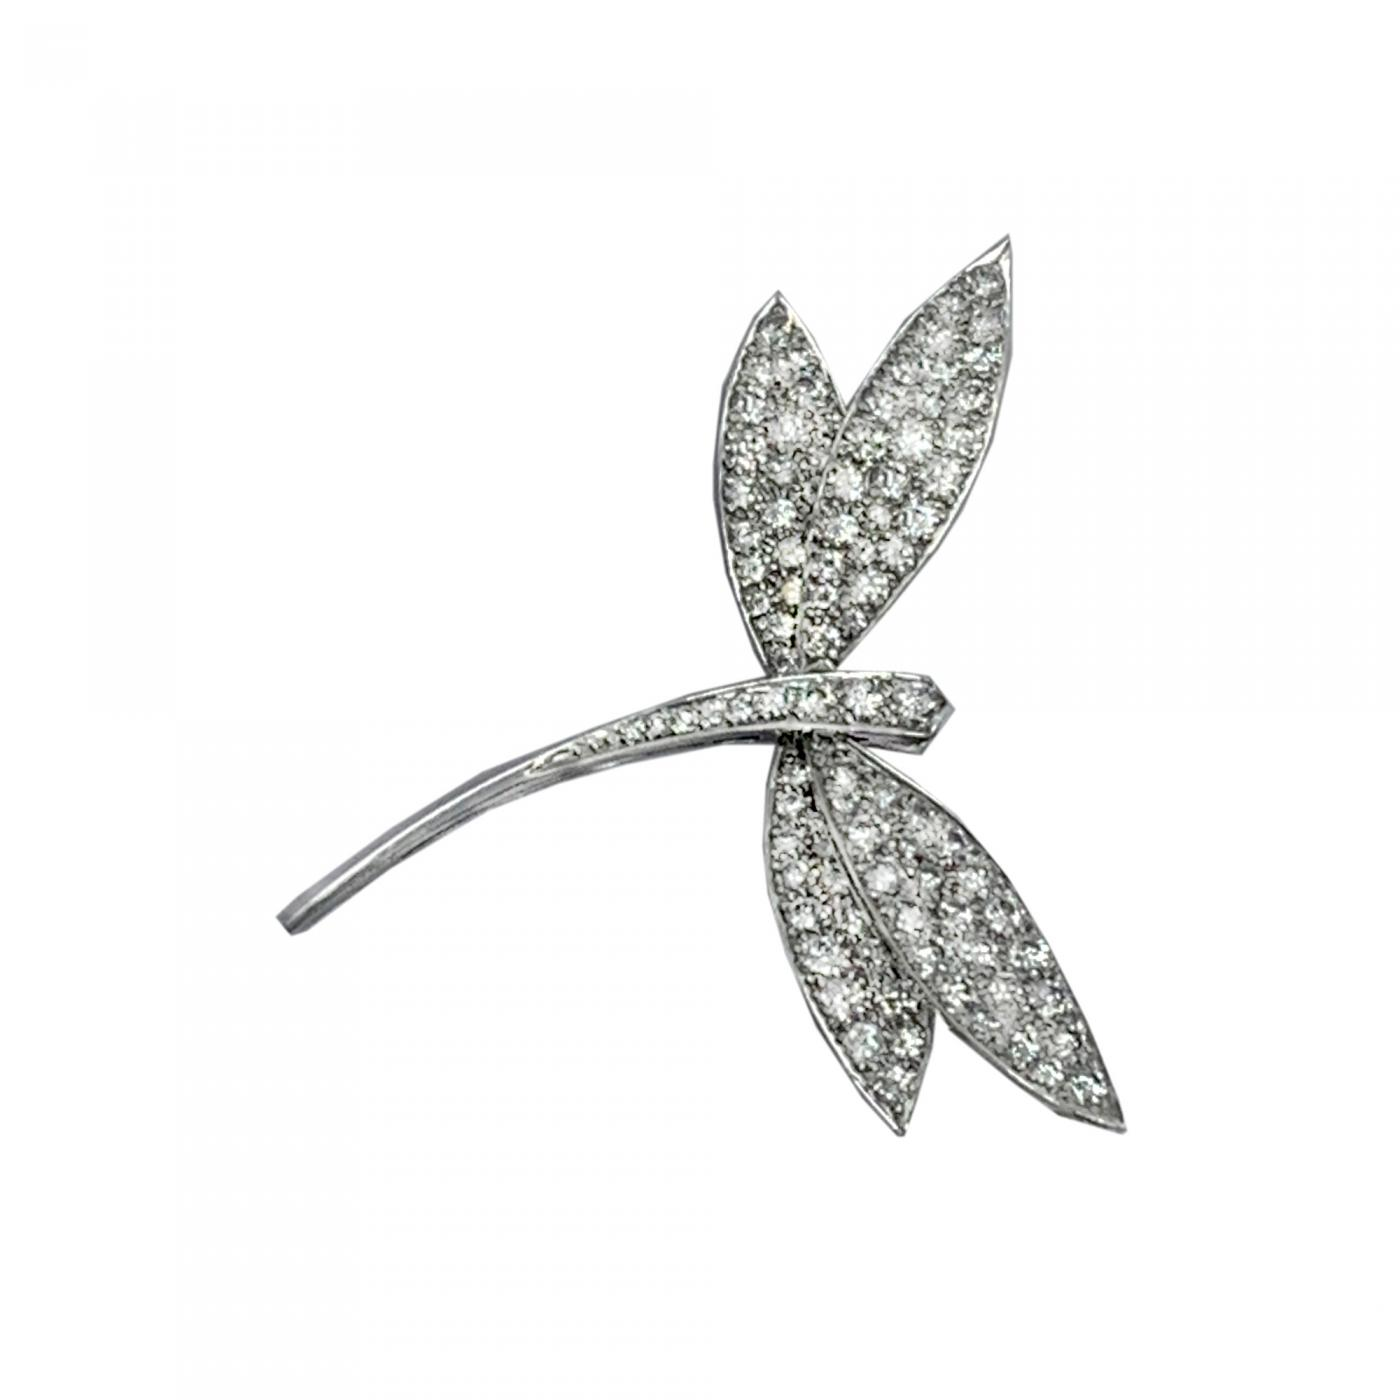 6b62cd6608776 Van Cleef & Arpels Diamond Dragonfly Pin